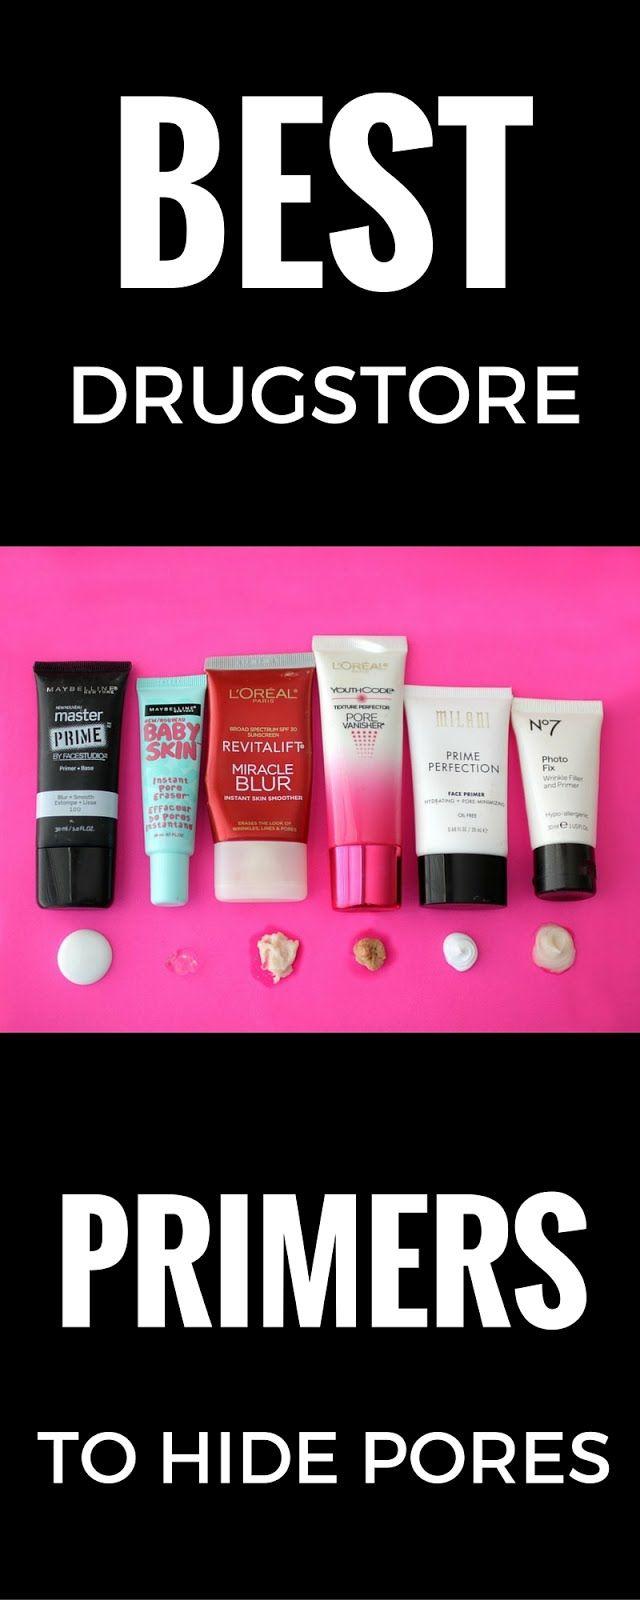 E l l e S e e s: Best Drugstore Primers to Hide Pores